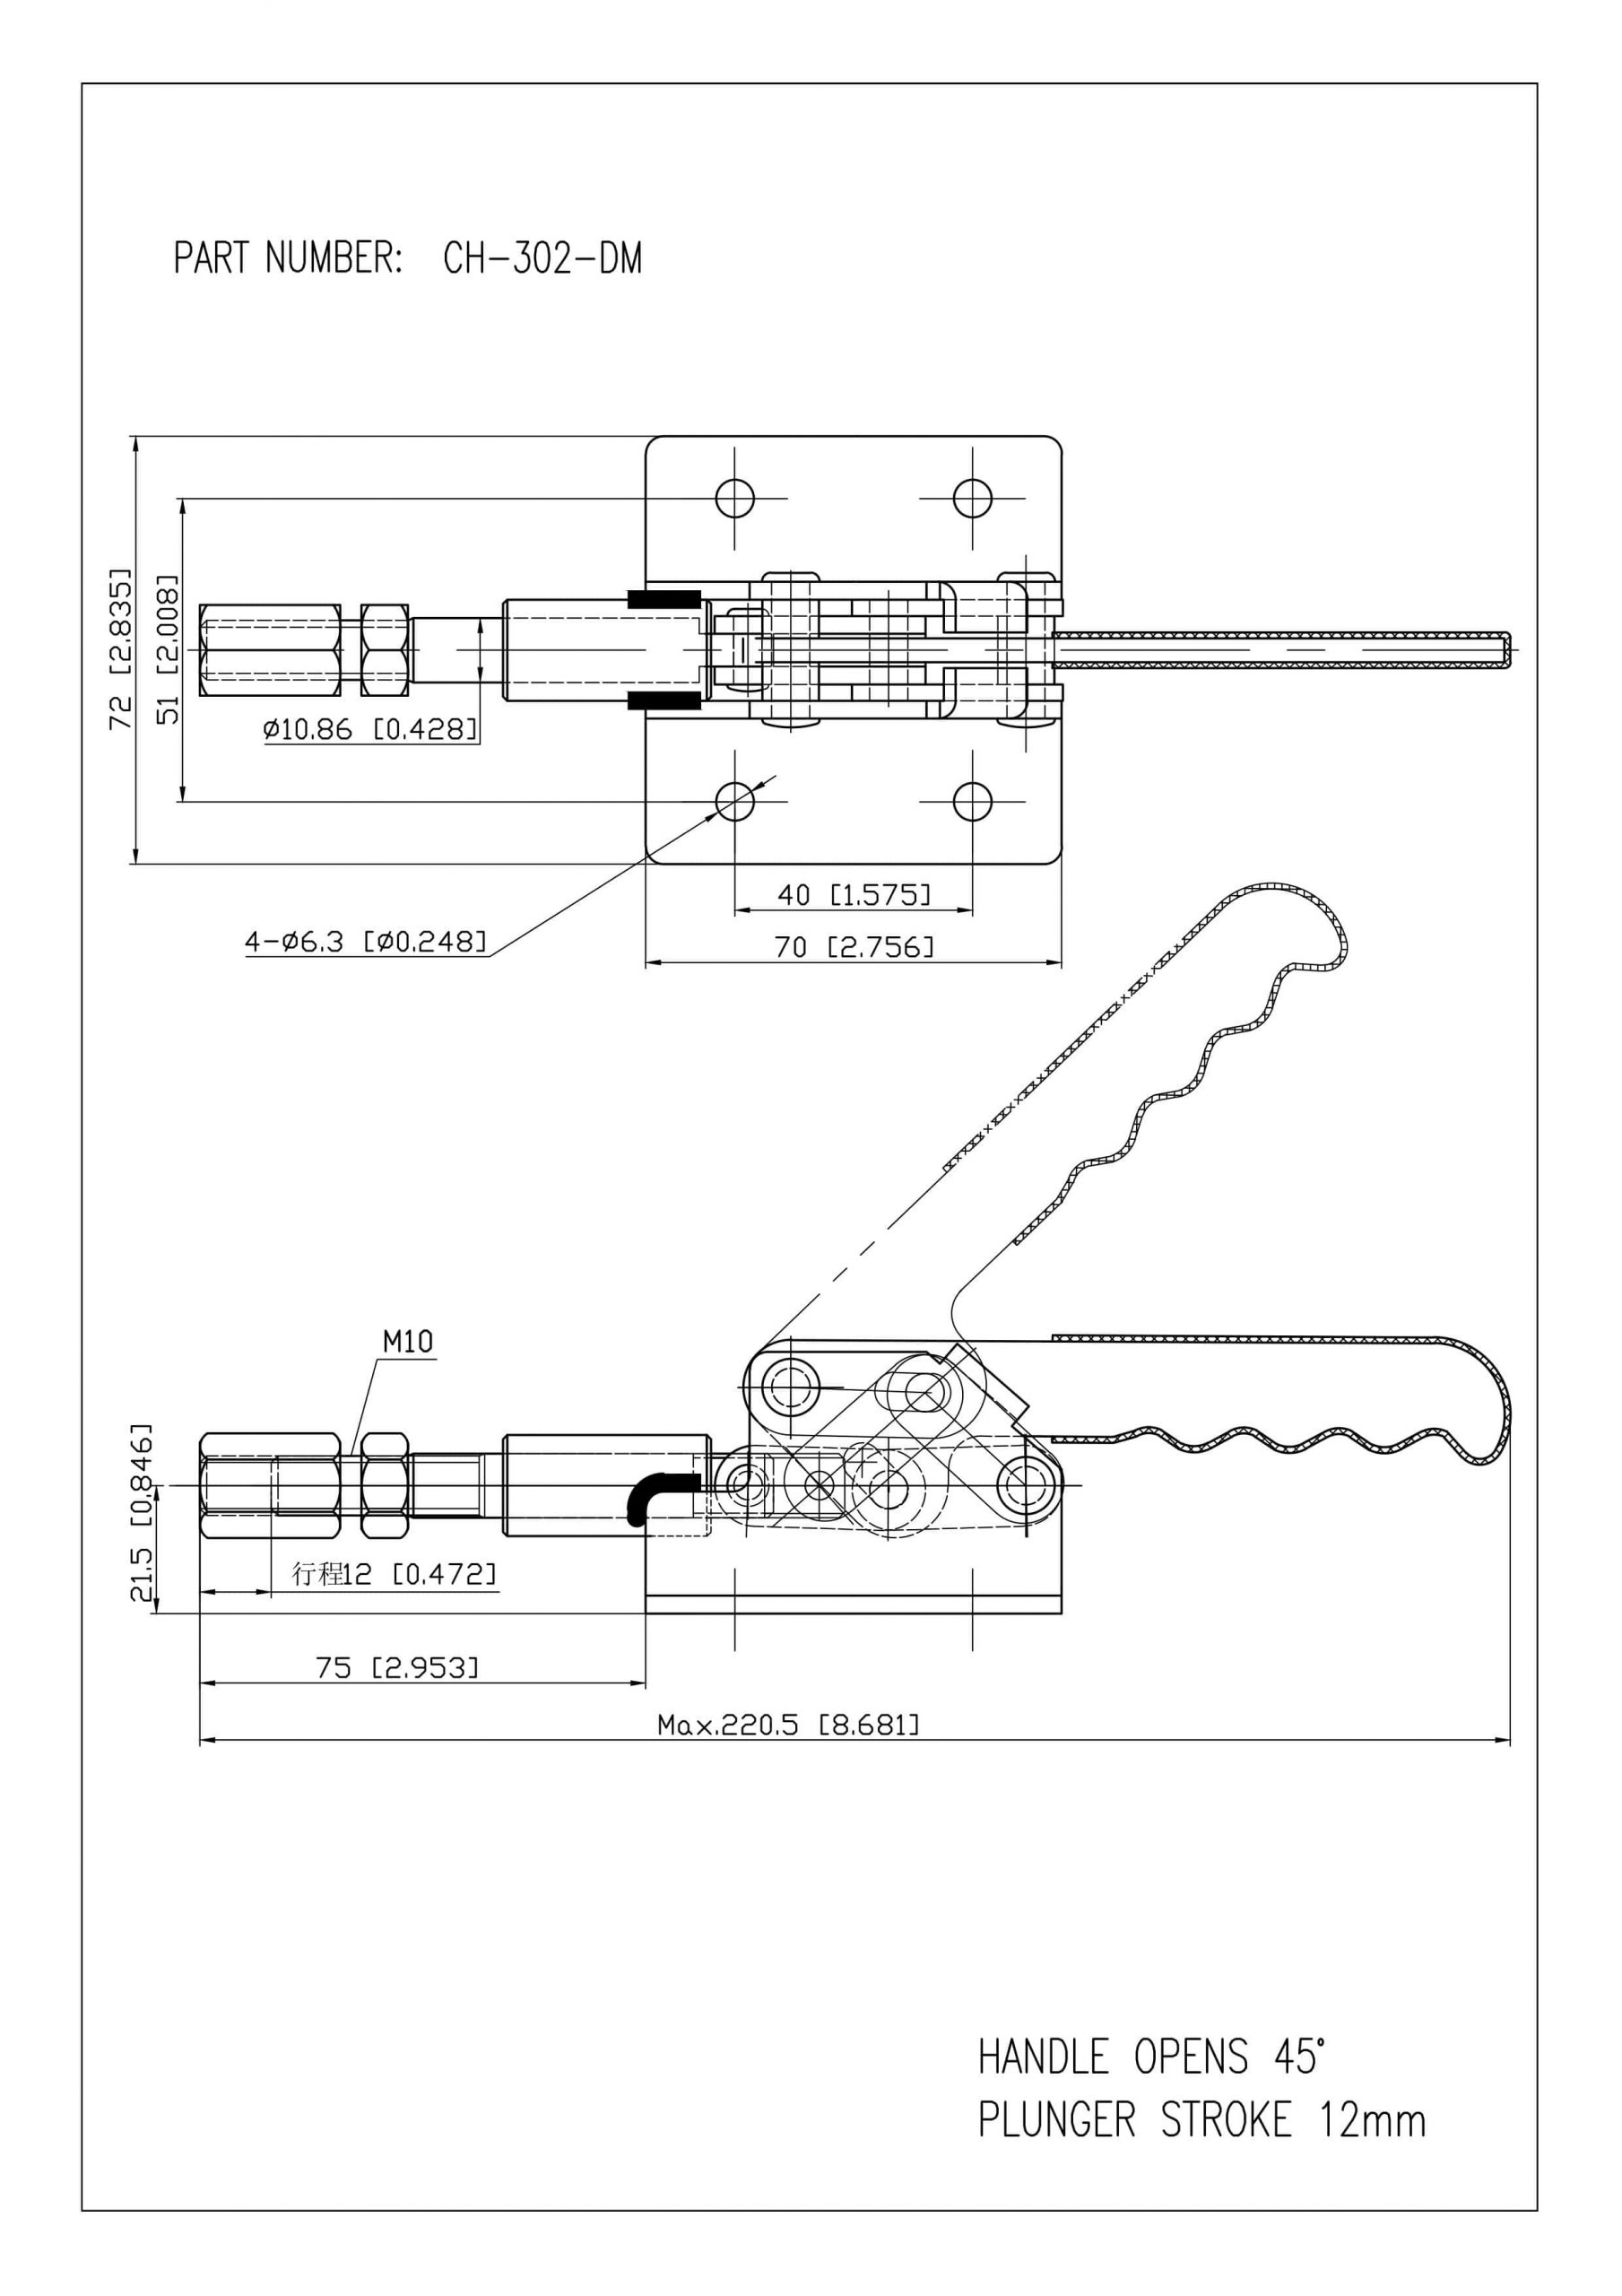 کاتالوگ کلمپ فشاری افقی CH-302-DM clamptek